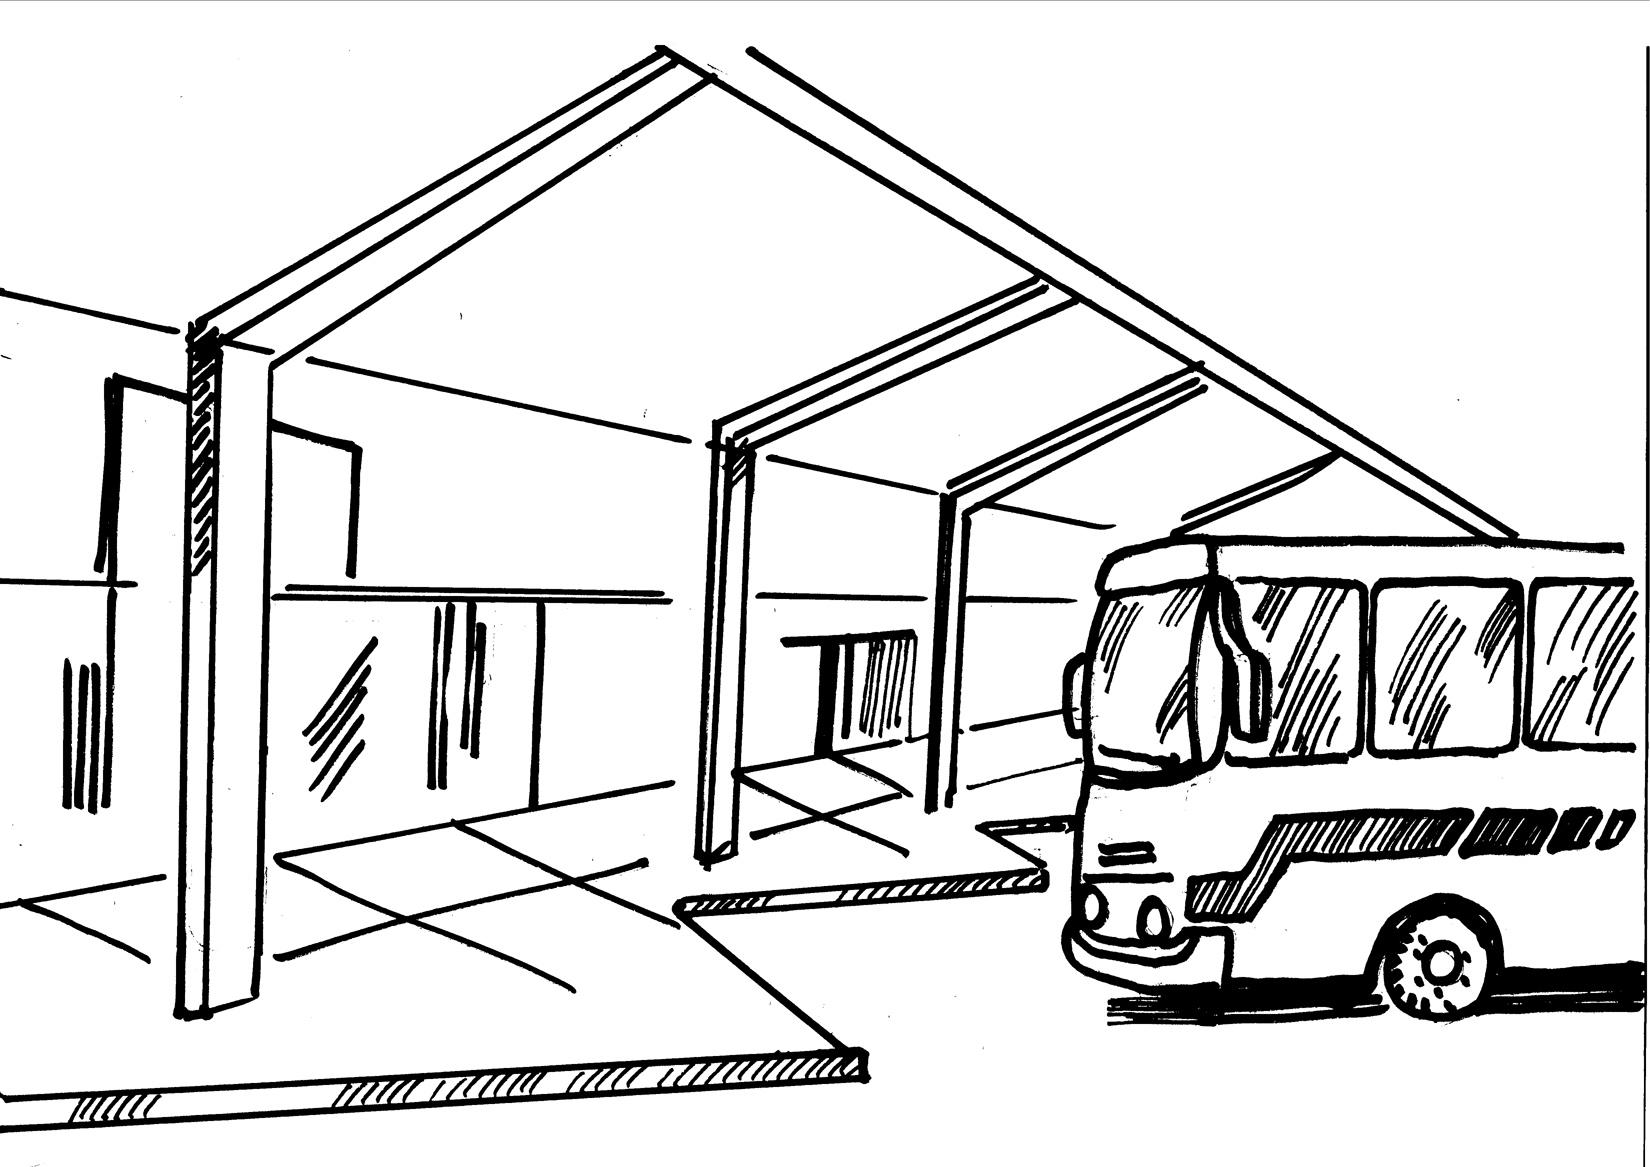 Train Station Drawing At Getdrawings